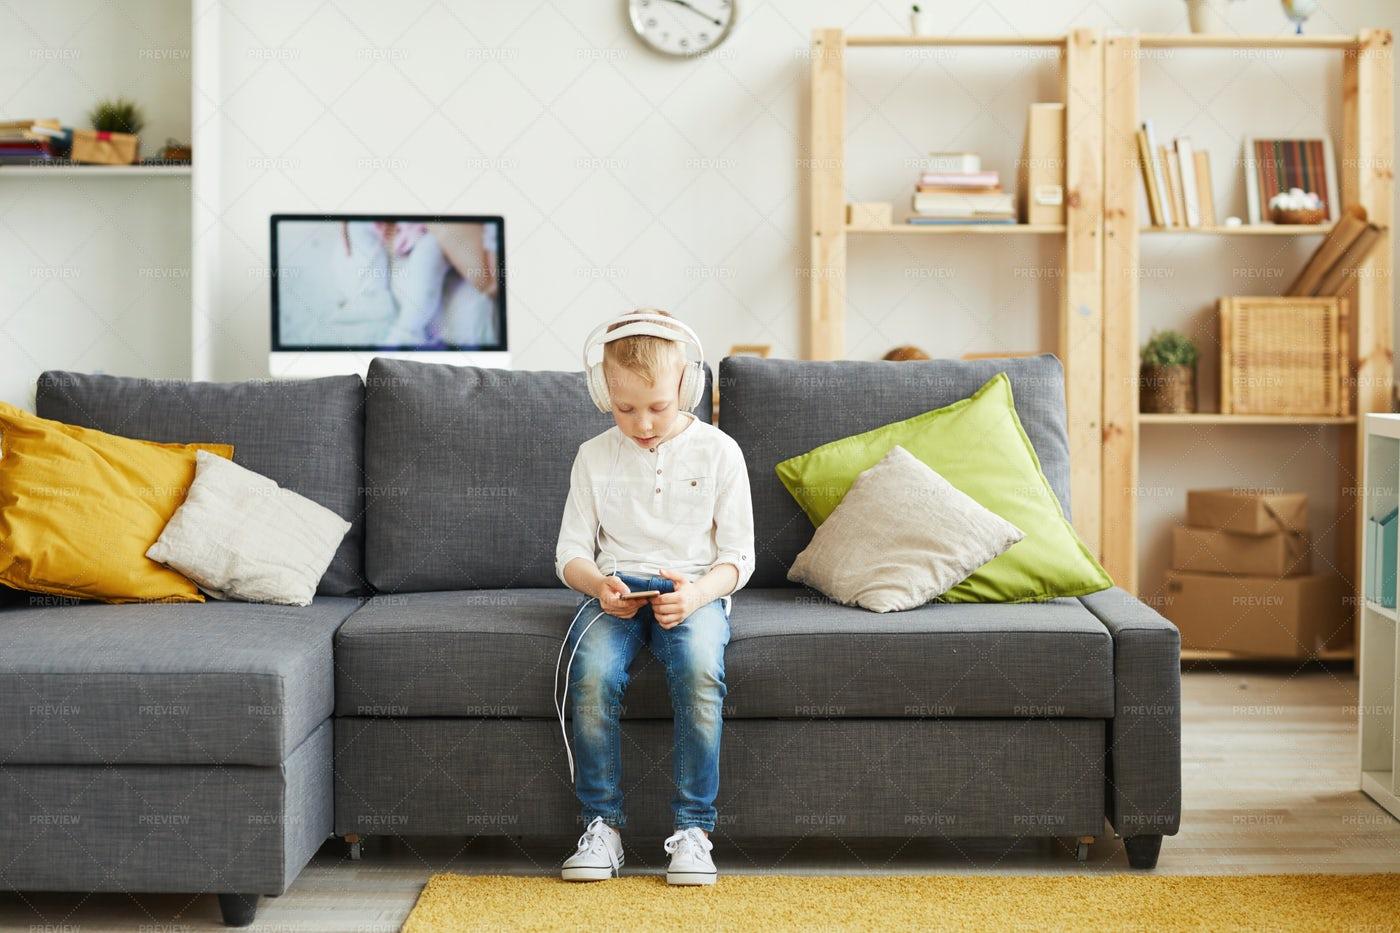 Adolescent Boy Choosing Music On...: Stock Photos